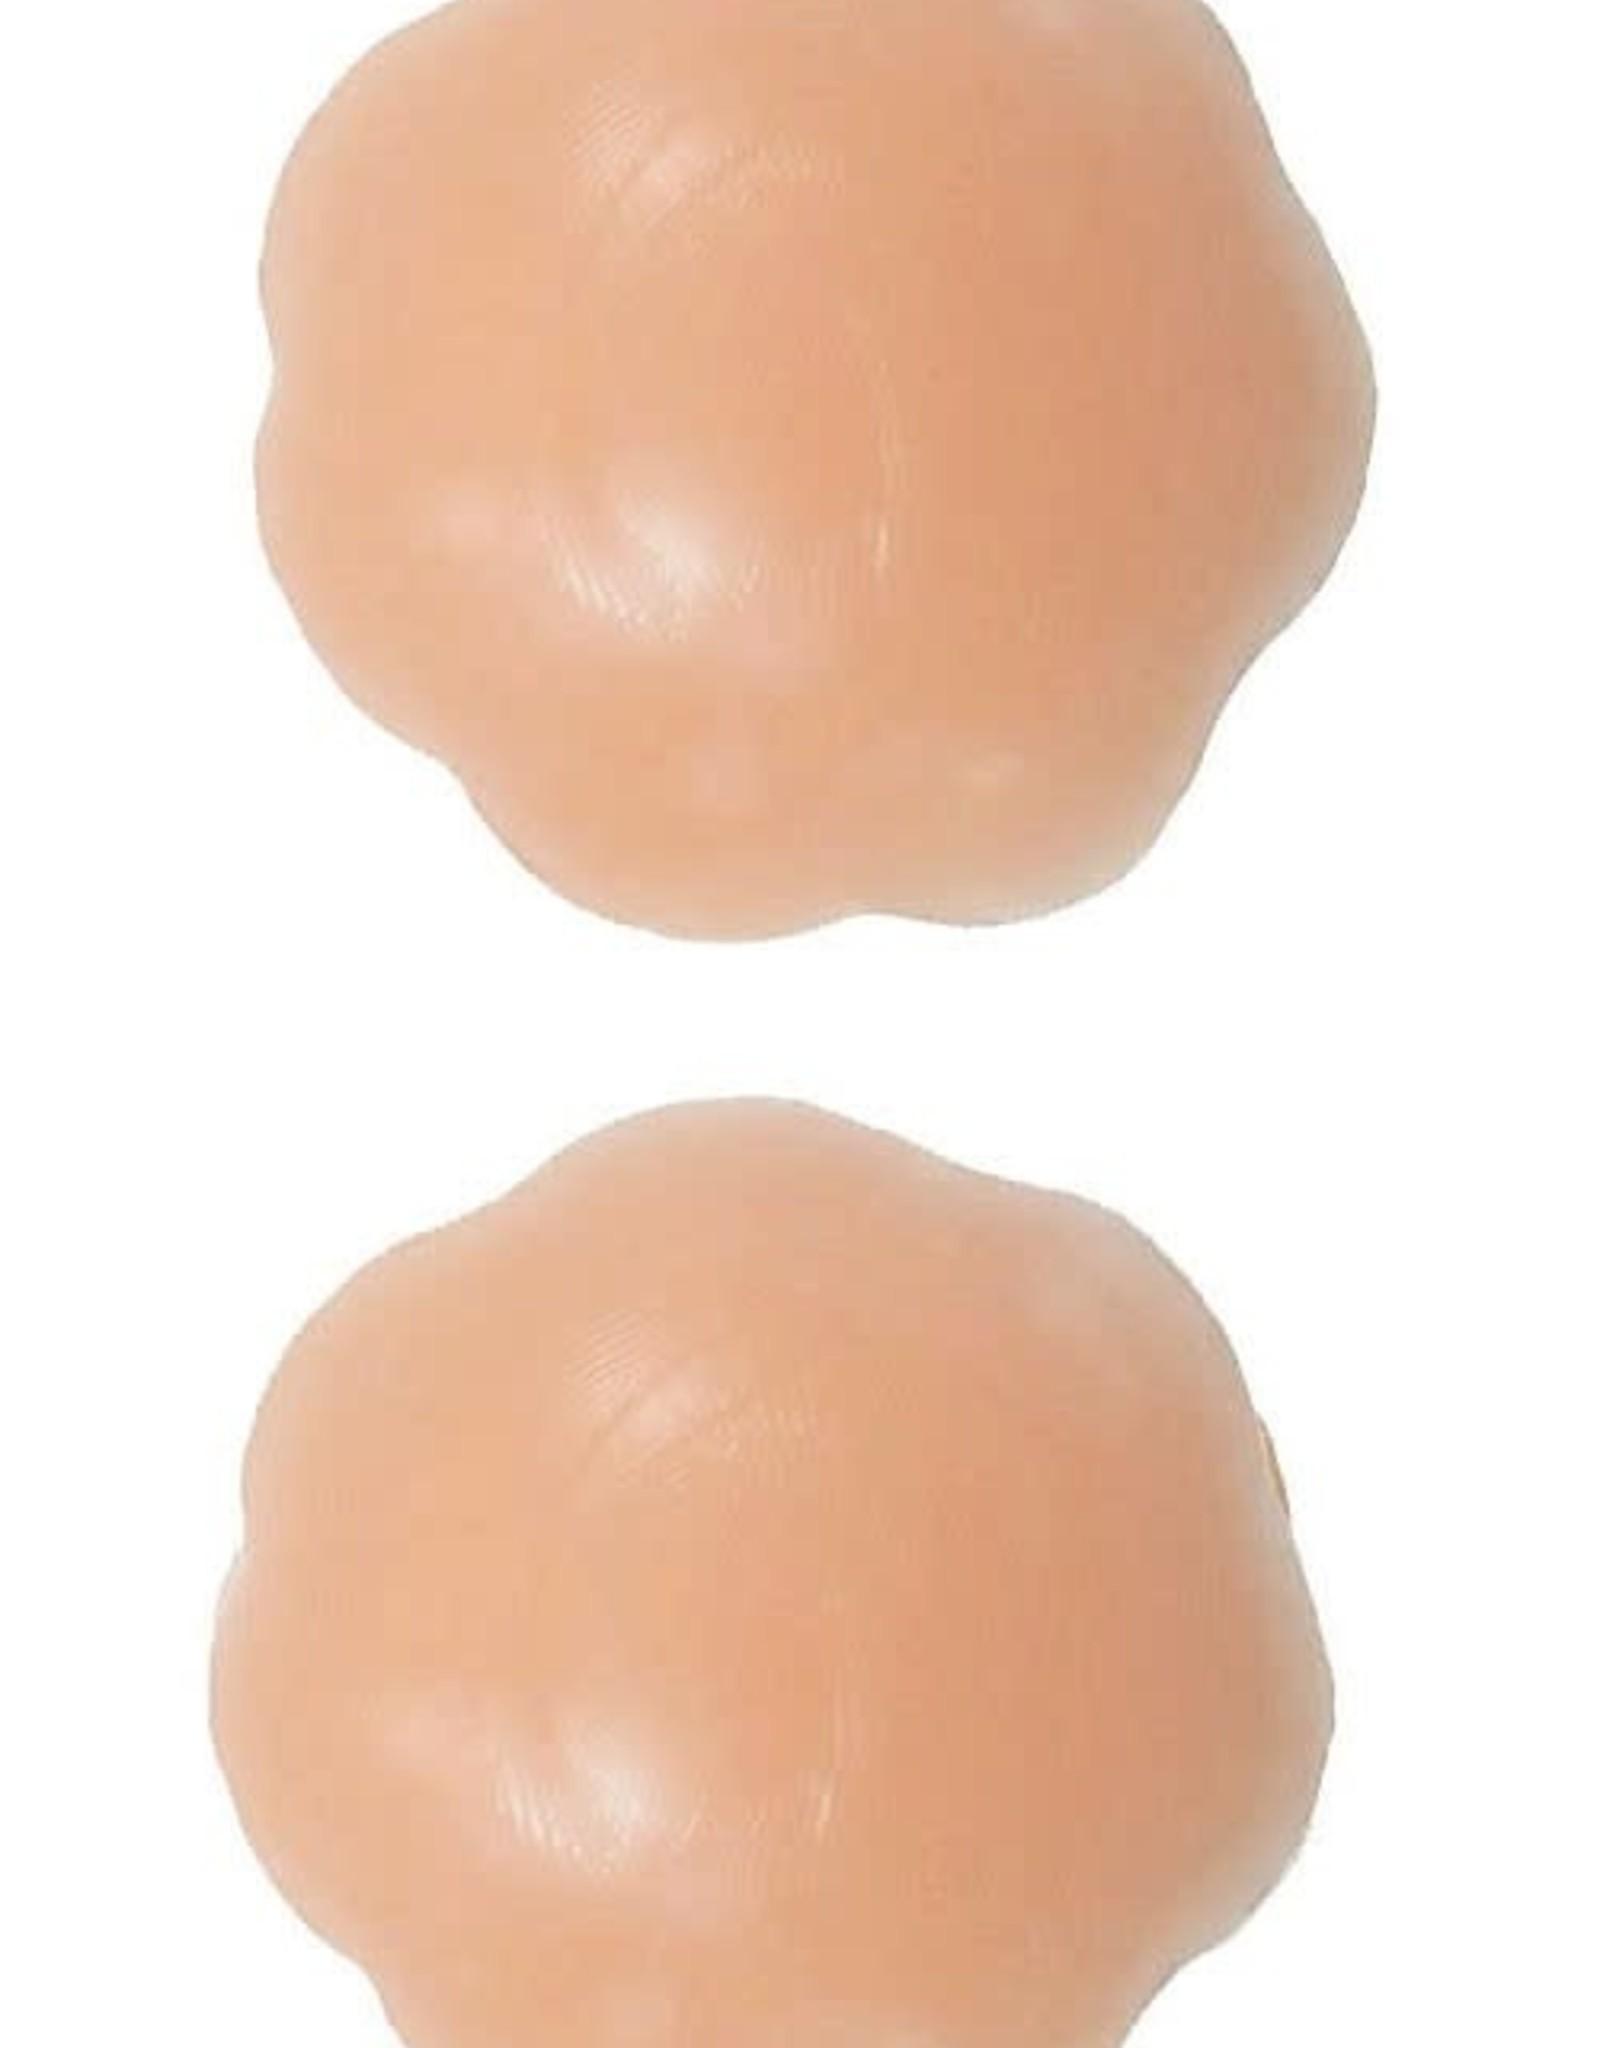 Anemone Silicone adhesive nipple cover